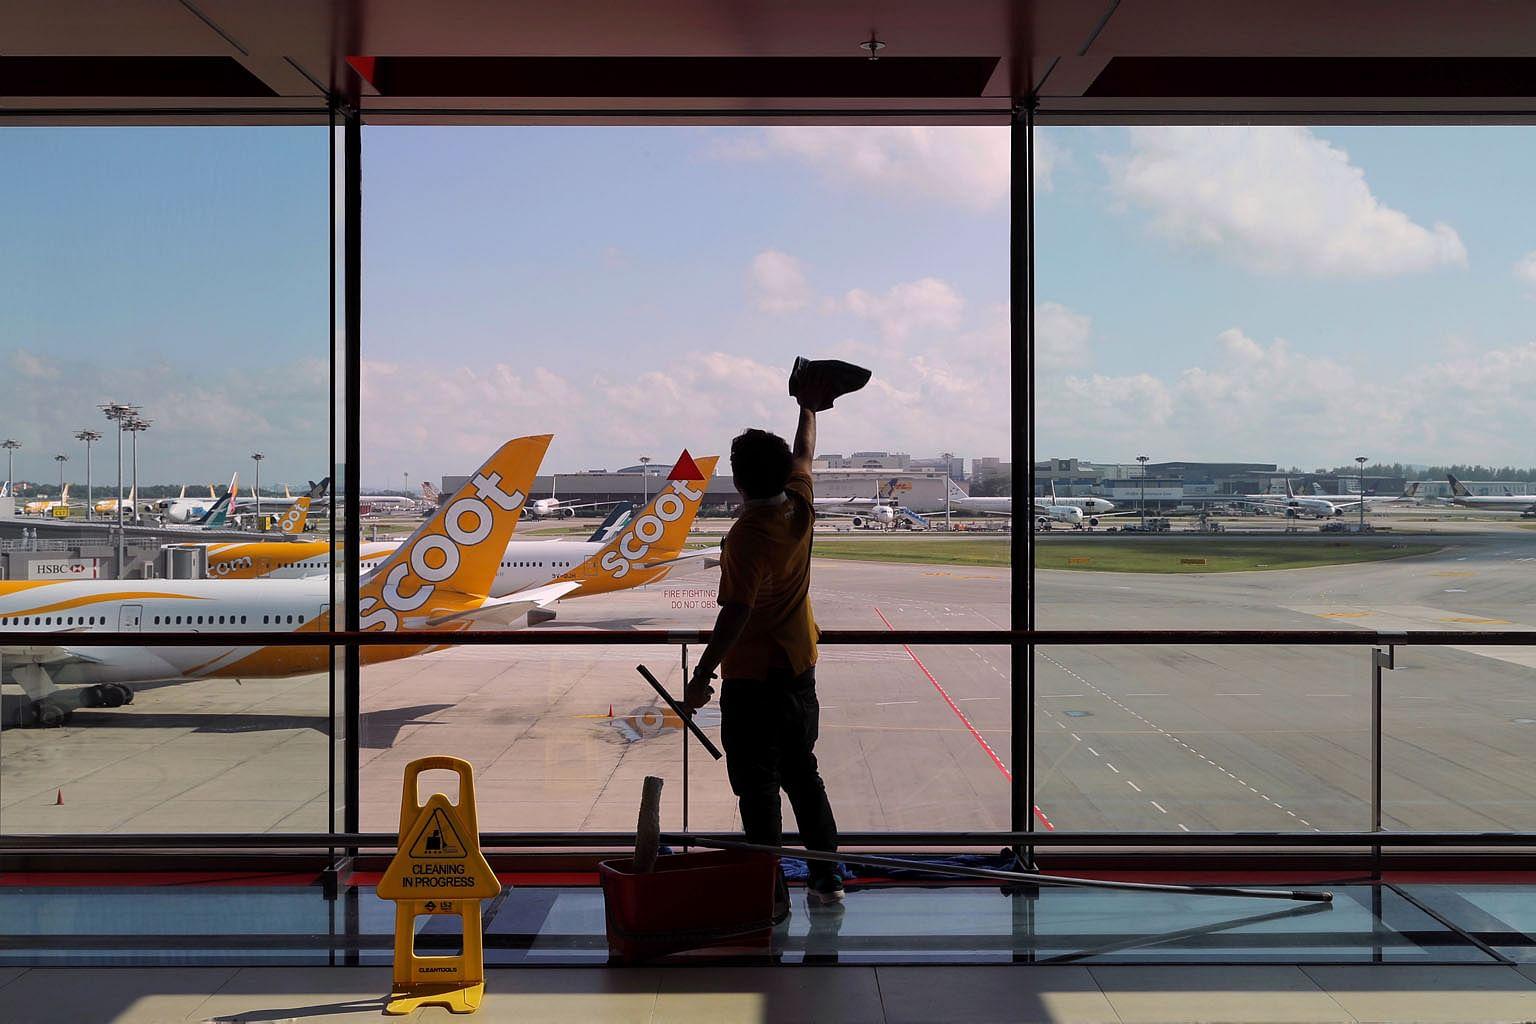 ELITE Brand Aviation Airplane Plane **AN ORIGINAL PRODUCE CRATE LABEL**